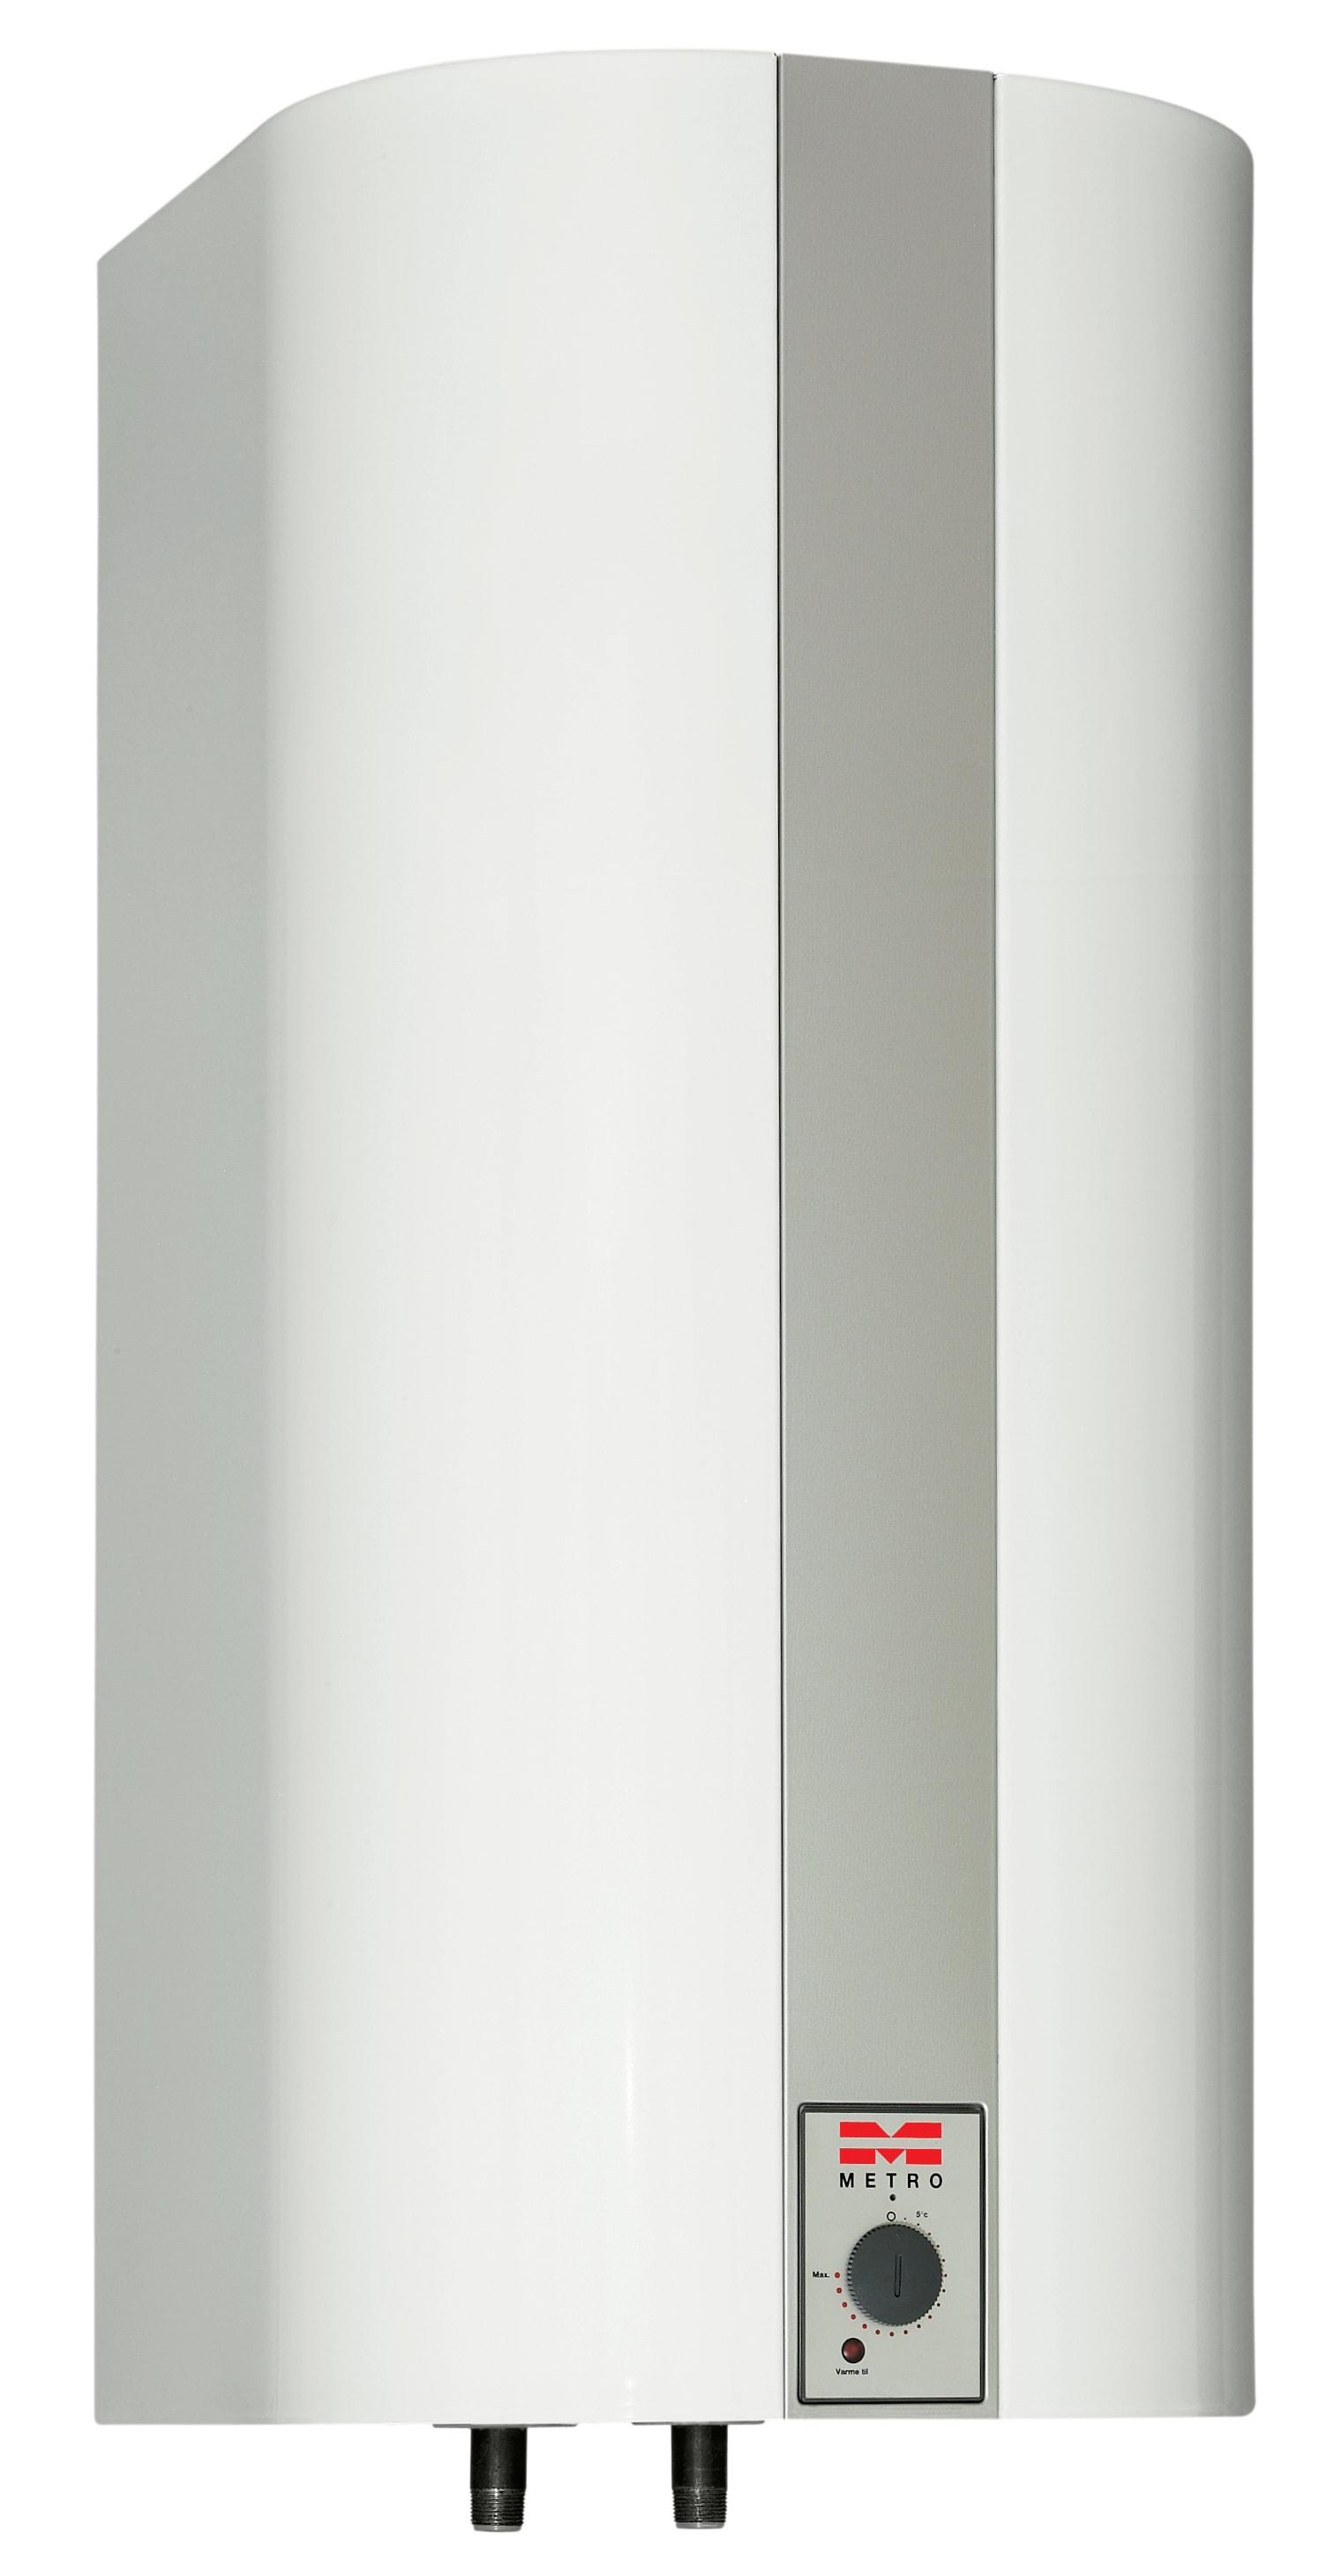 Seneste Køb Metro El-vandvarmer, model 110 345121560 QS92